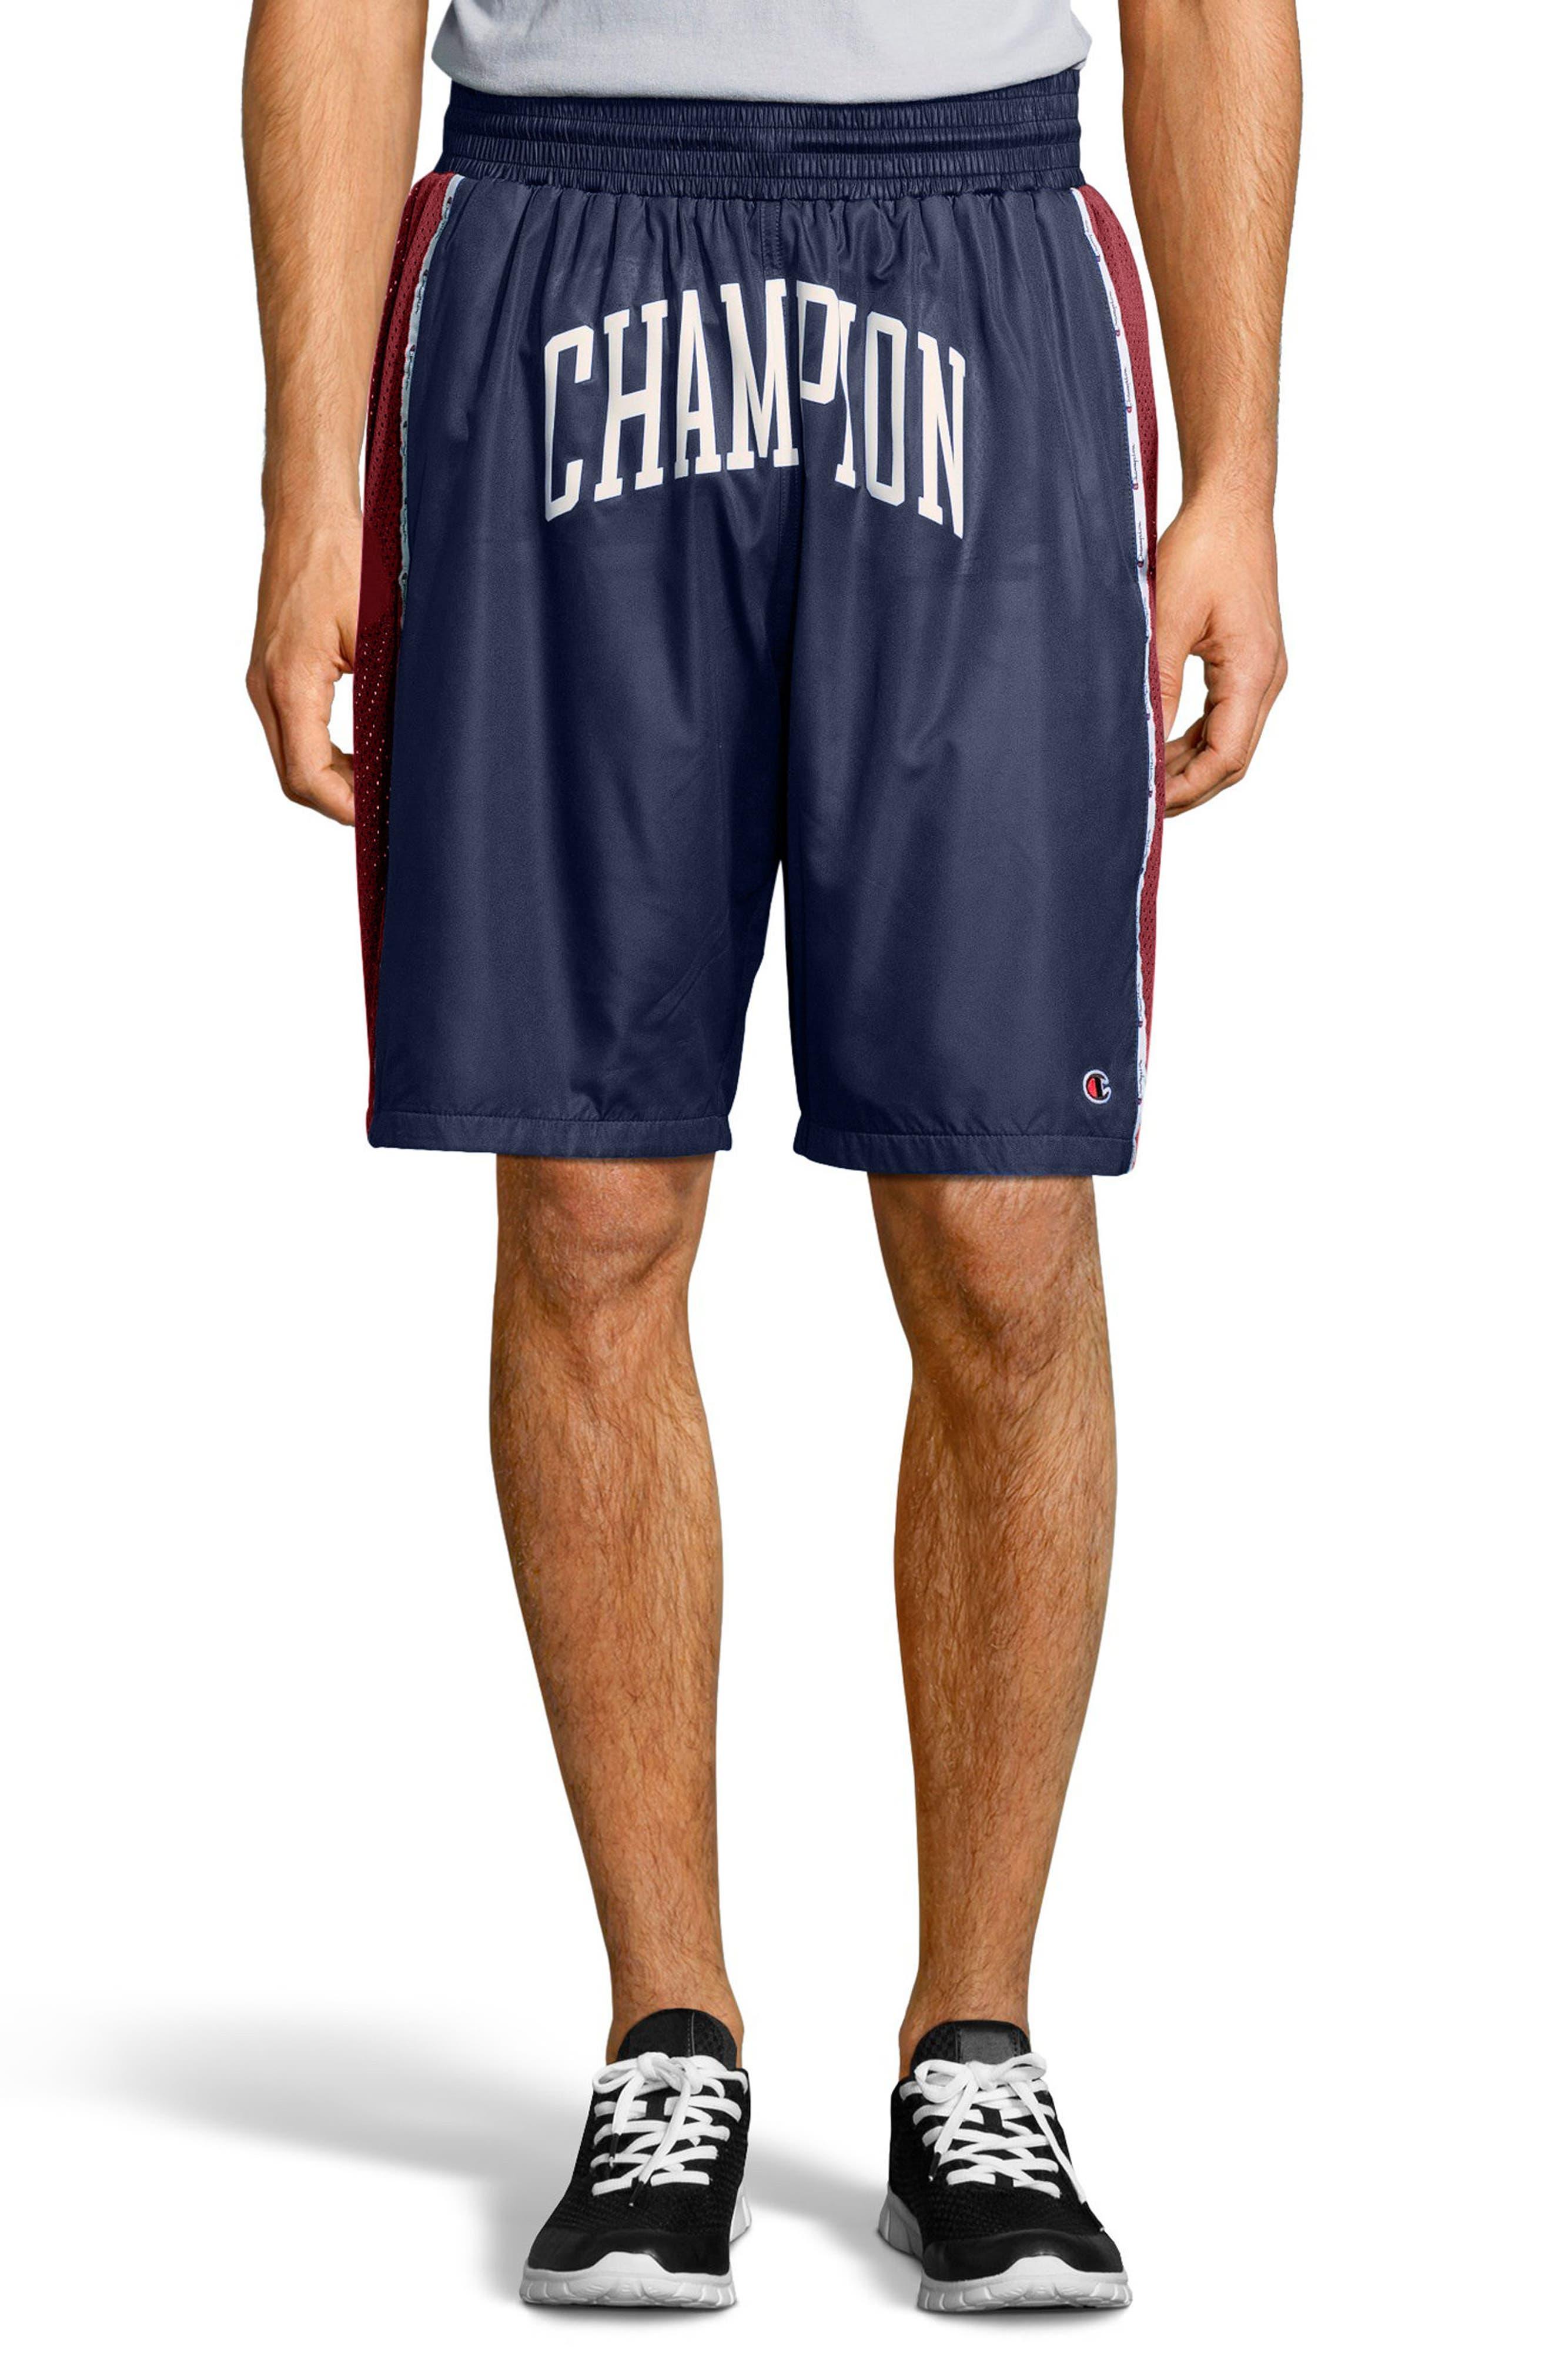 Satin Shorts,                         Main,                         color, Imperail Indigo/Navy